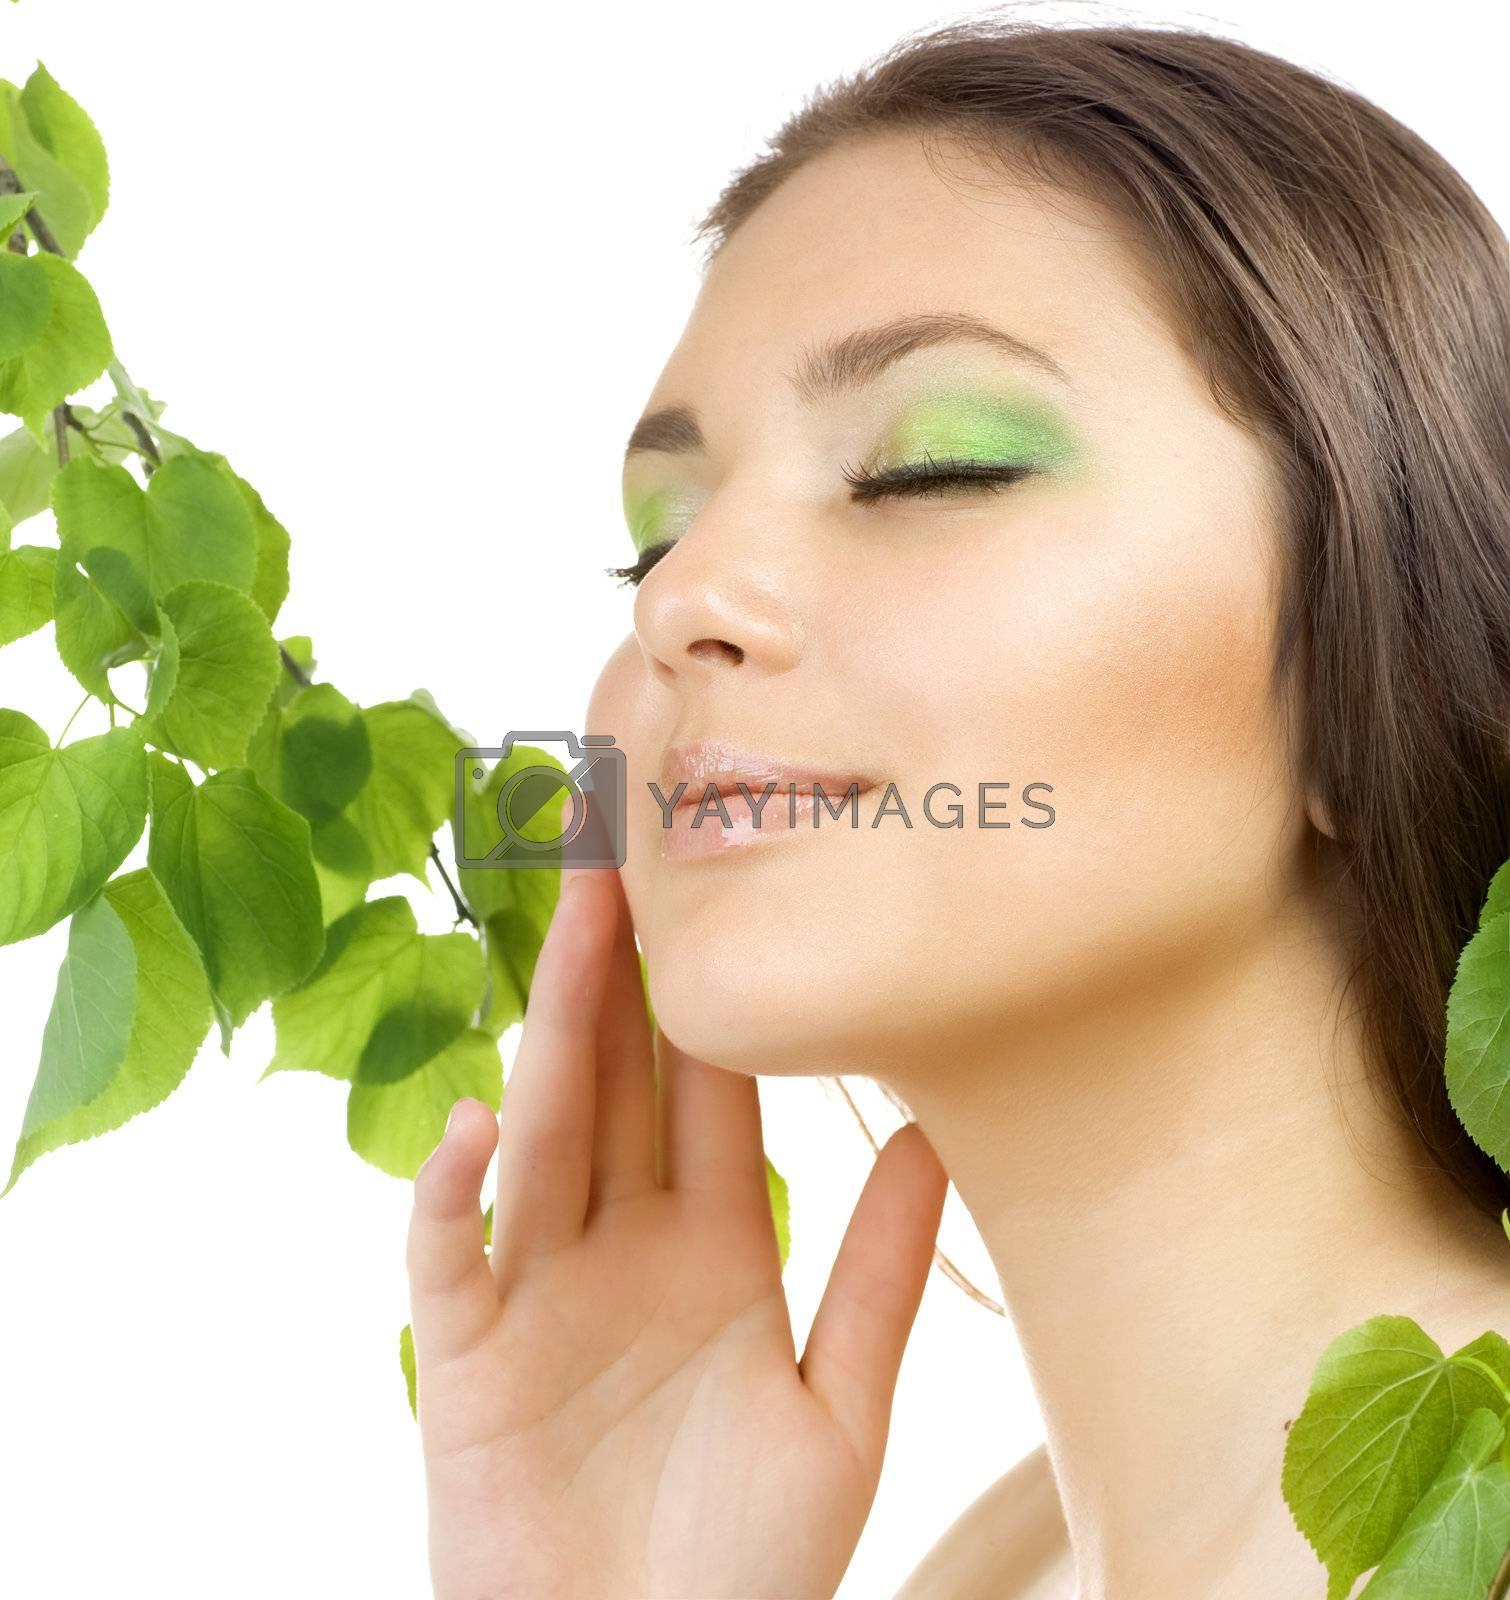 Beautiful Young Woman Touching Her Face. Healthy Skin